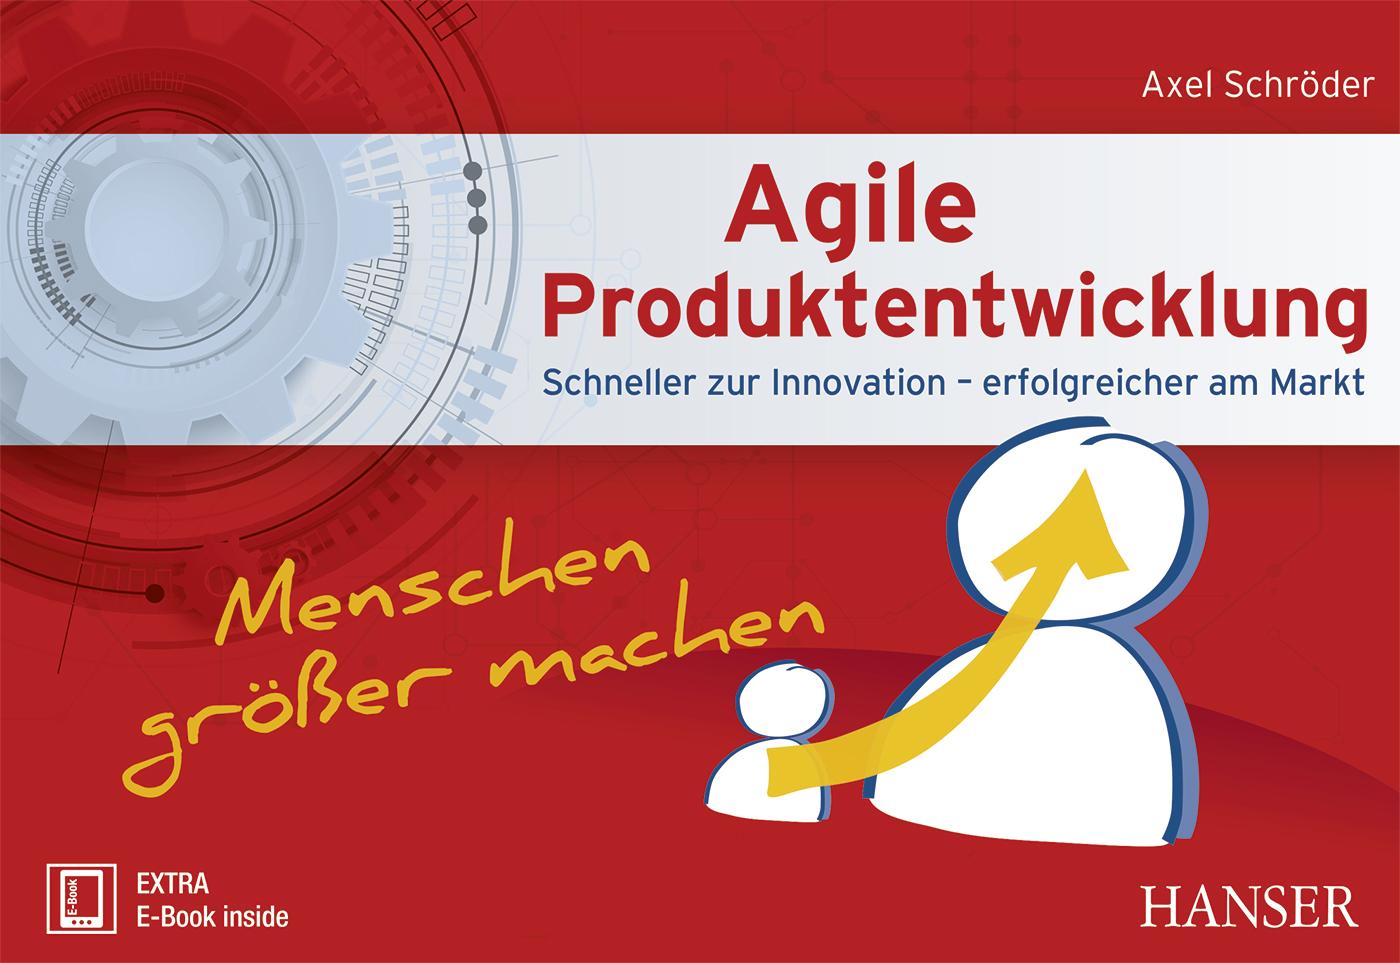 Agile Produktentwicklung, 978-3-446-45015-8